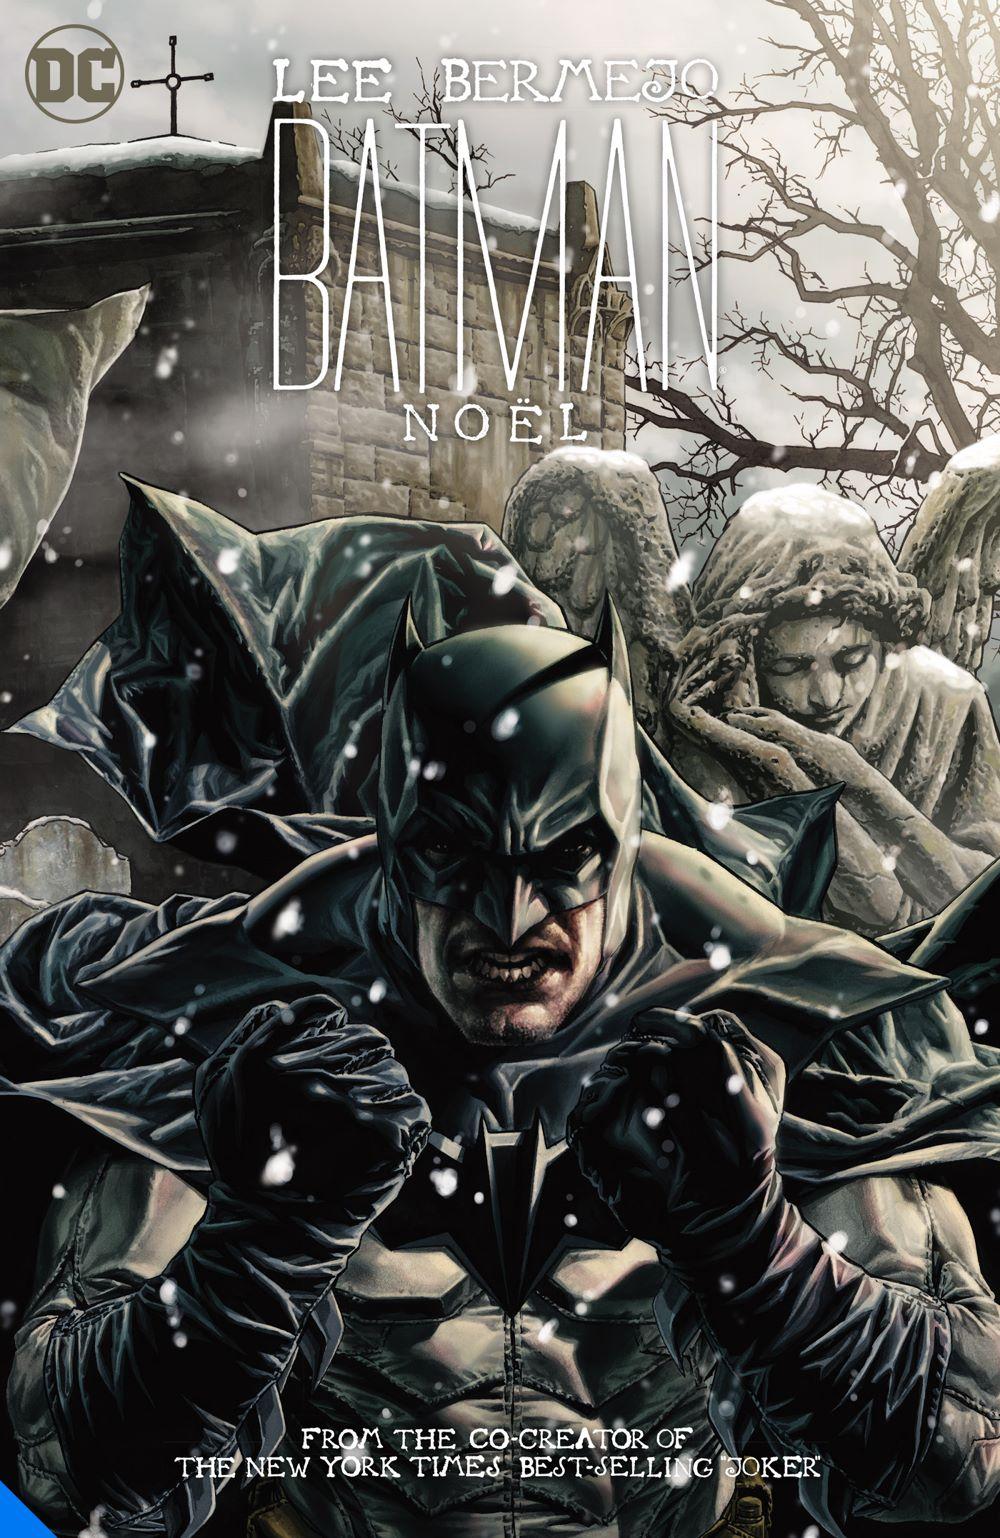 batmannoel_adv DC Comics August 2021 Solicitations